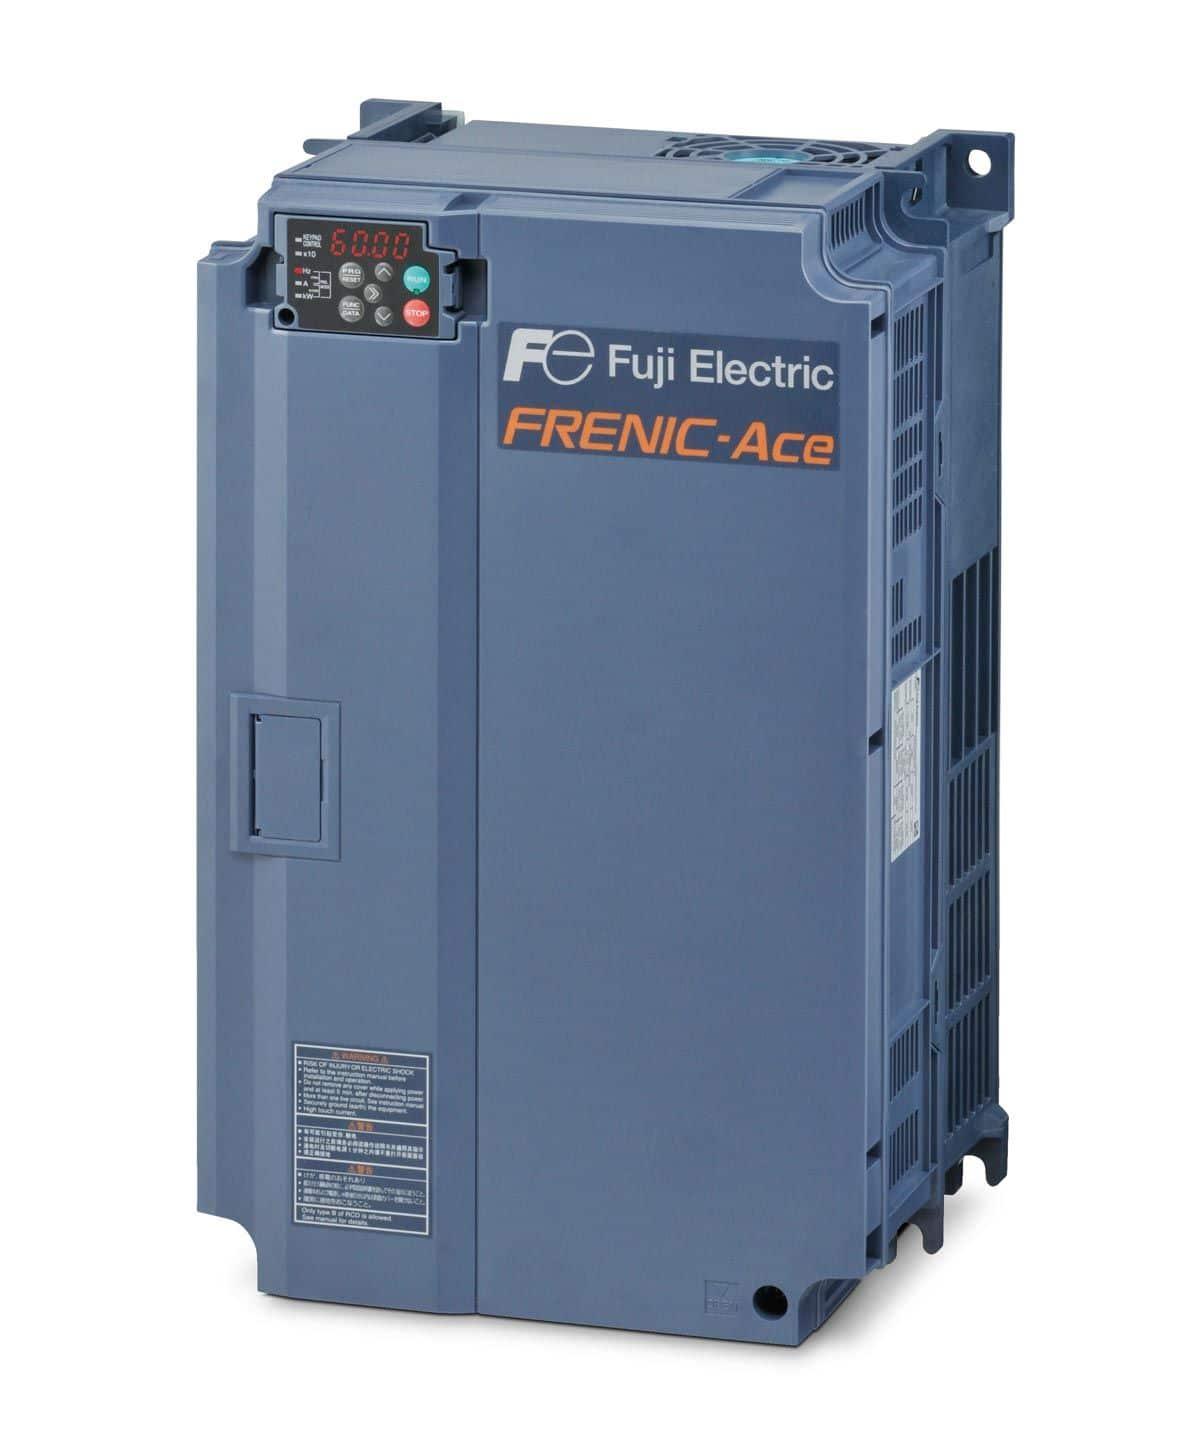 Fuji Electric Motor Wiring Diagrams - Car Fuse Box Wiring Diagram •